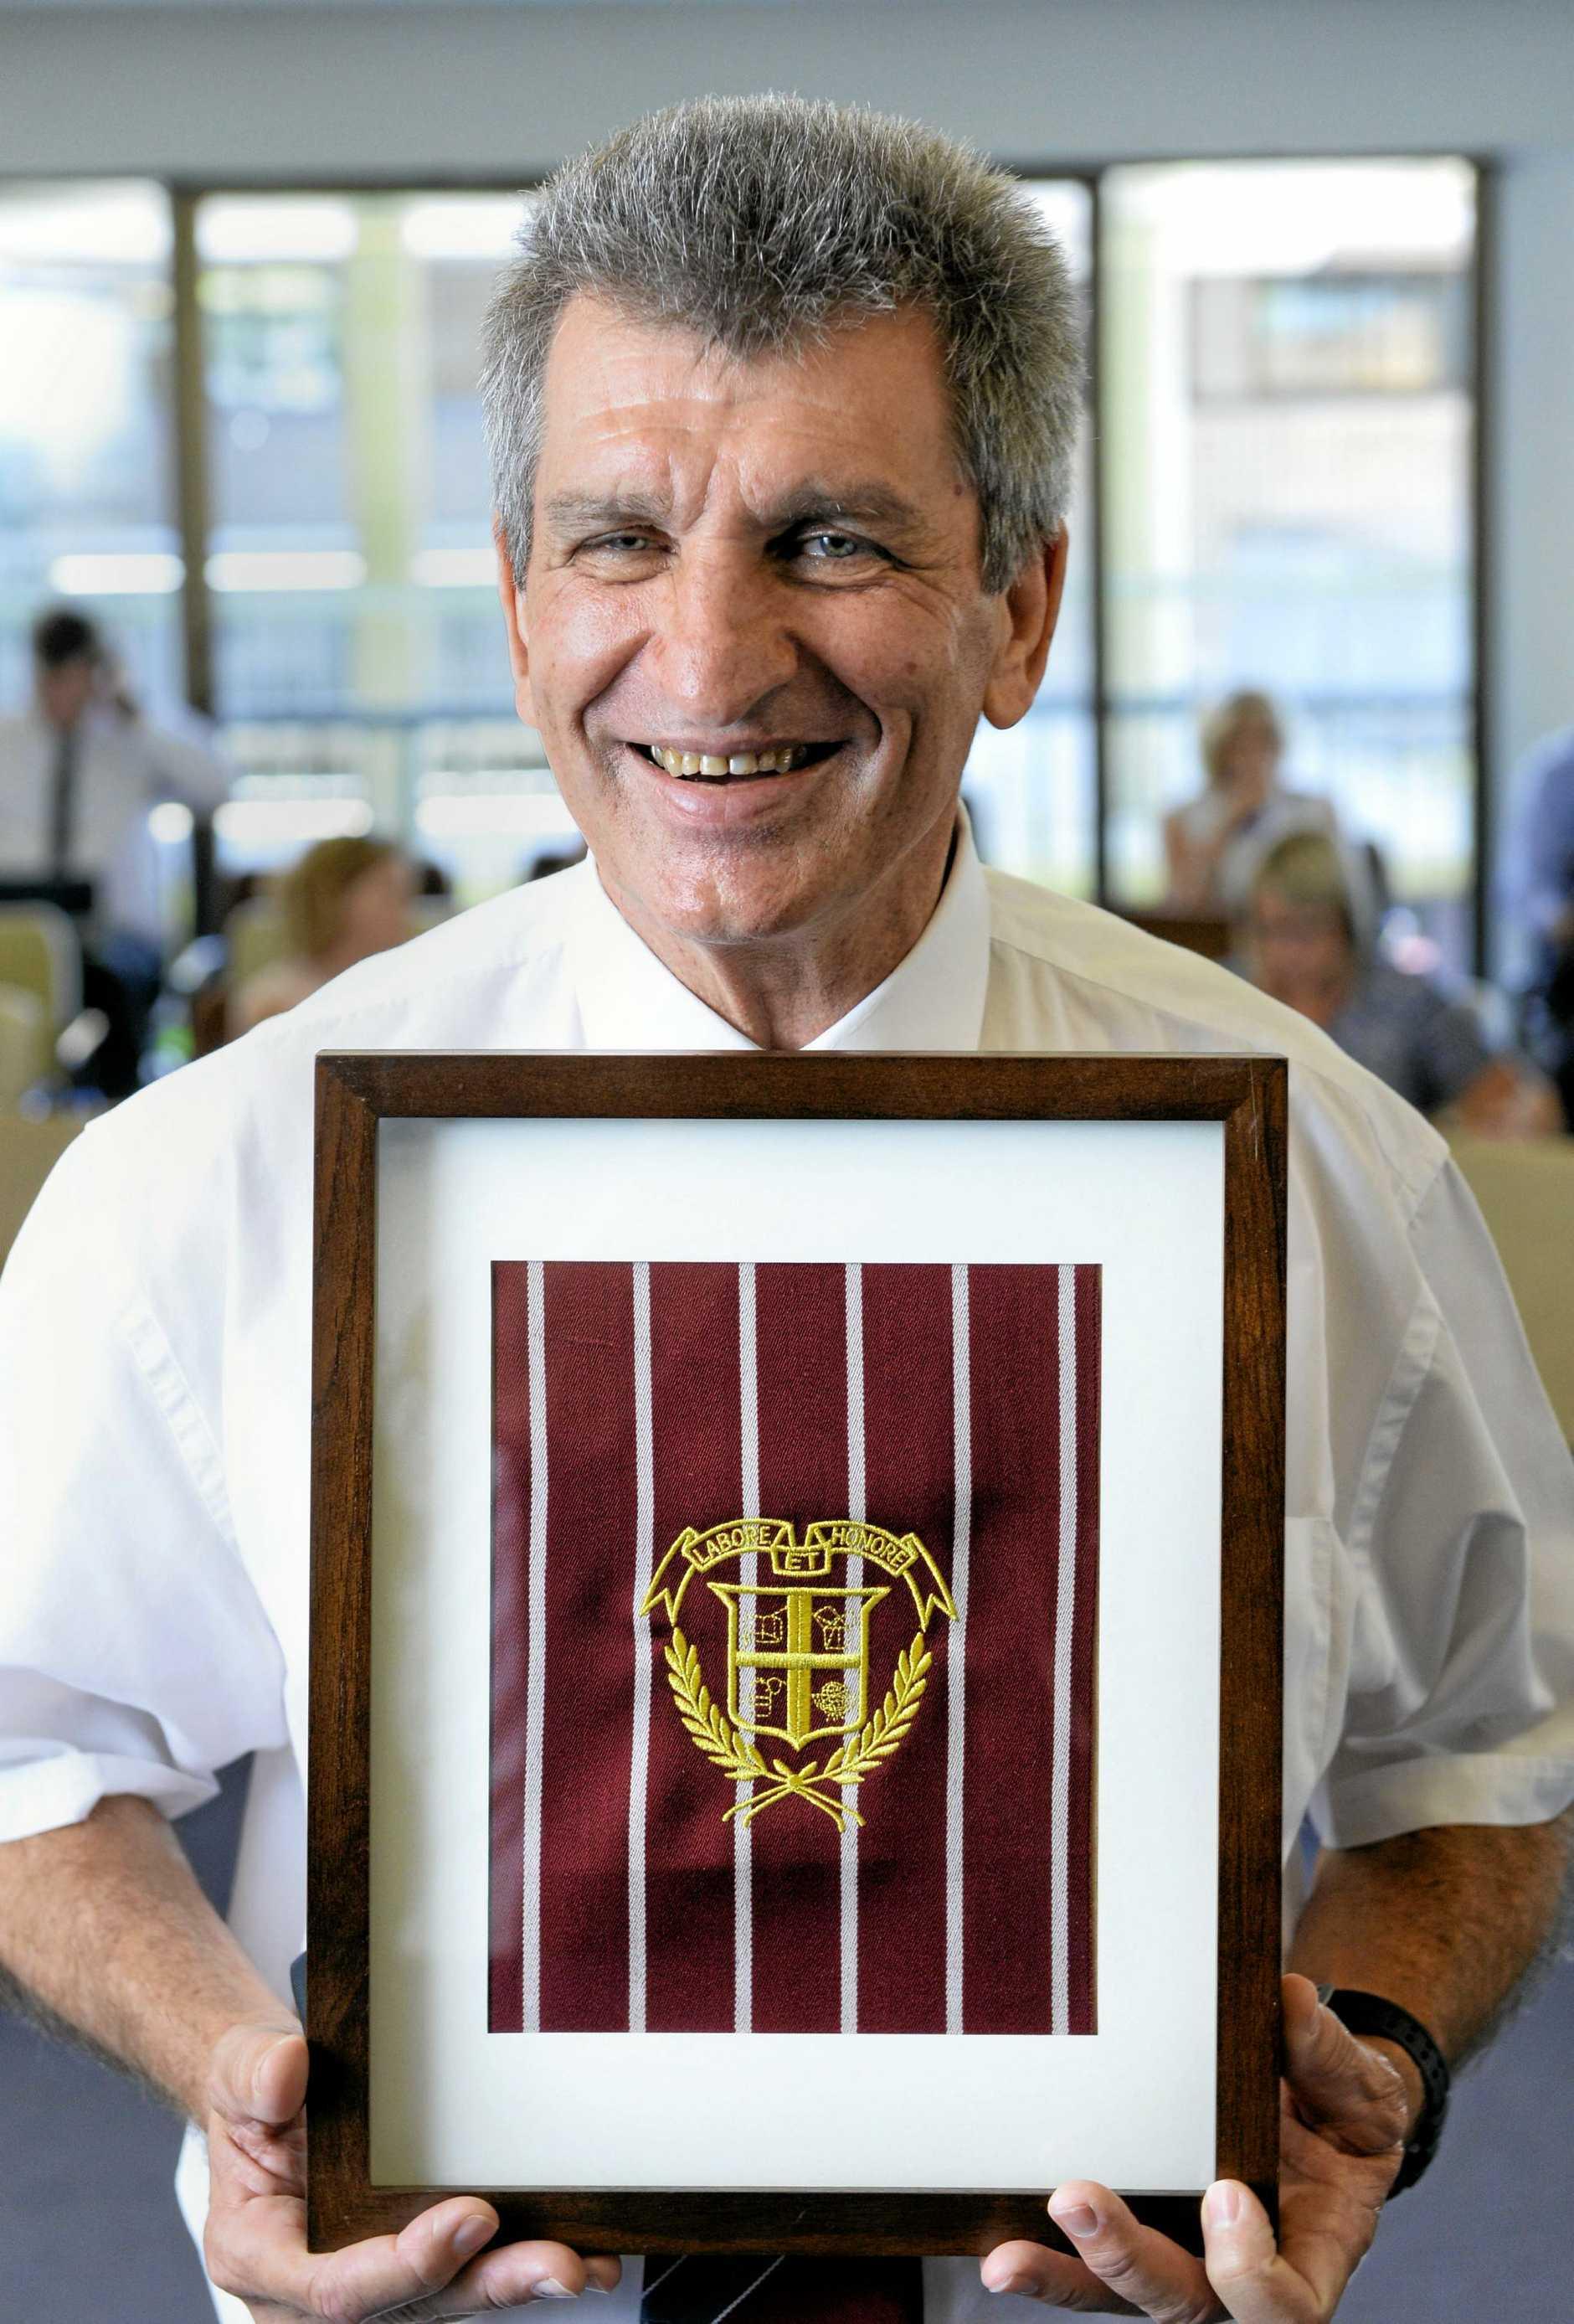 Geoff Dieckmann is retiring from Ipswich Grammar School after 47 years. He was presented with a gold blazer pocket by the school.